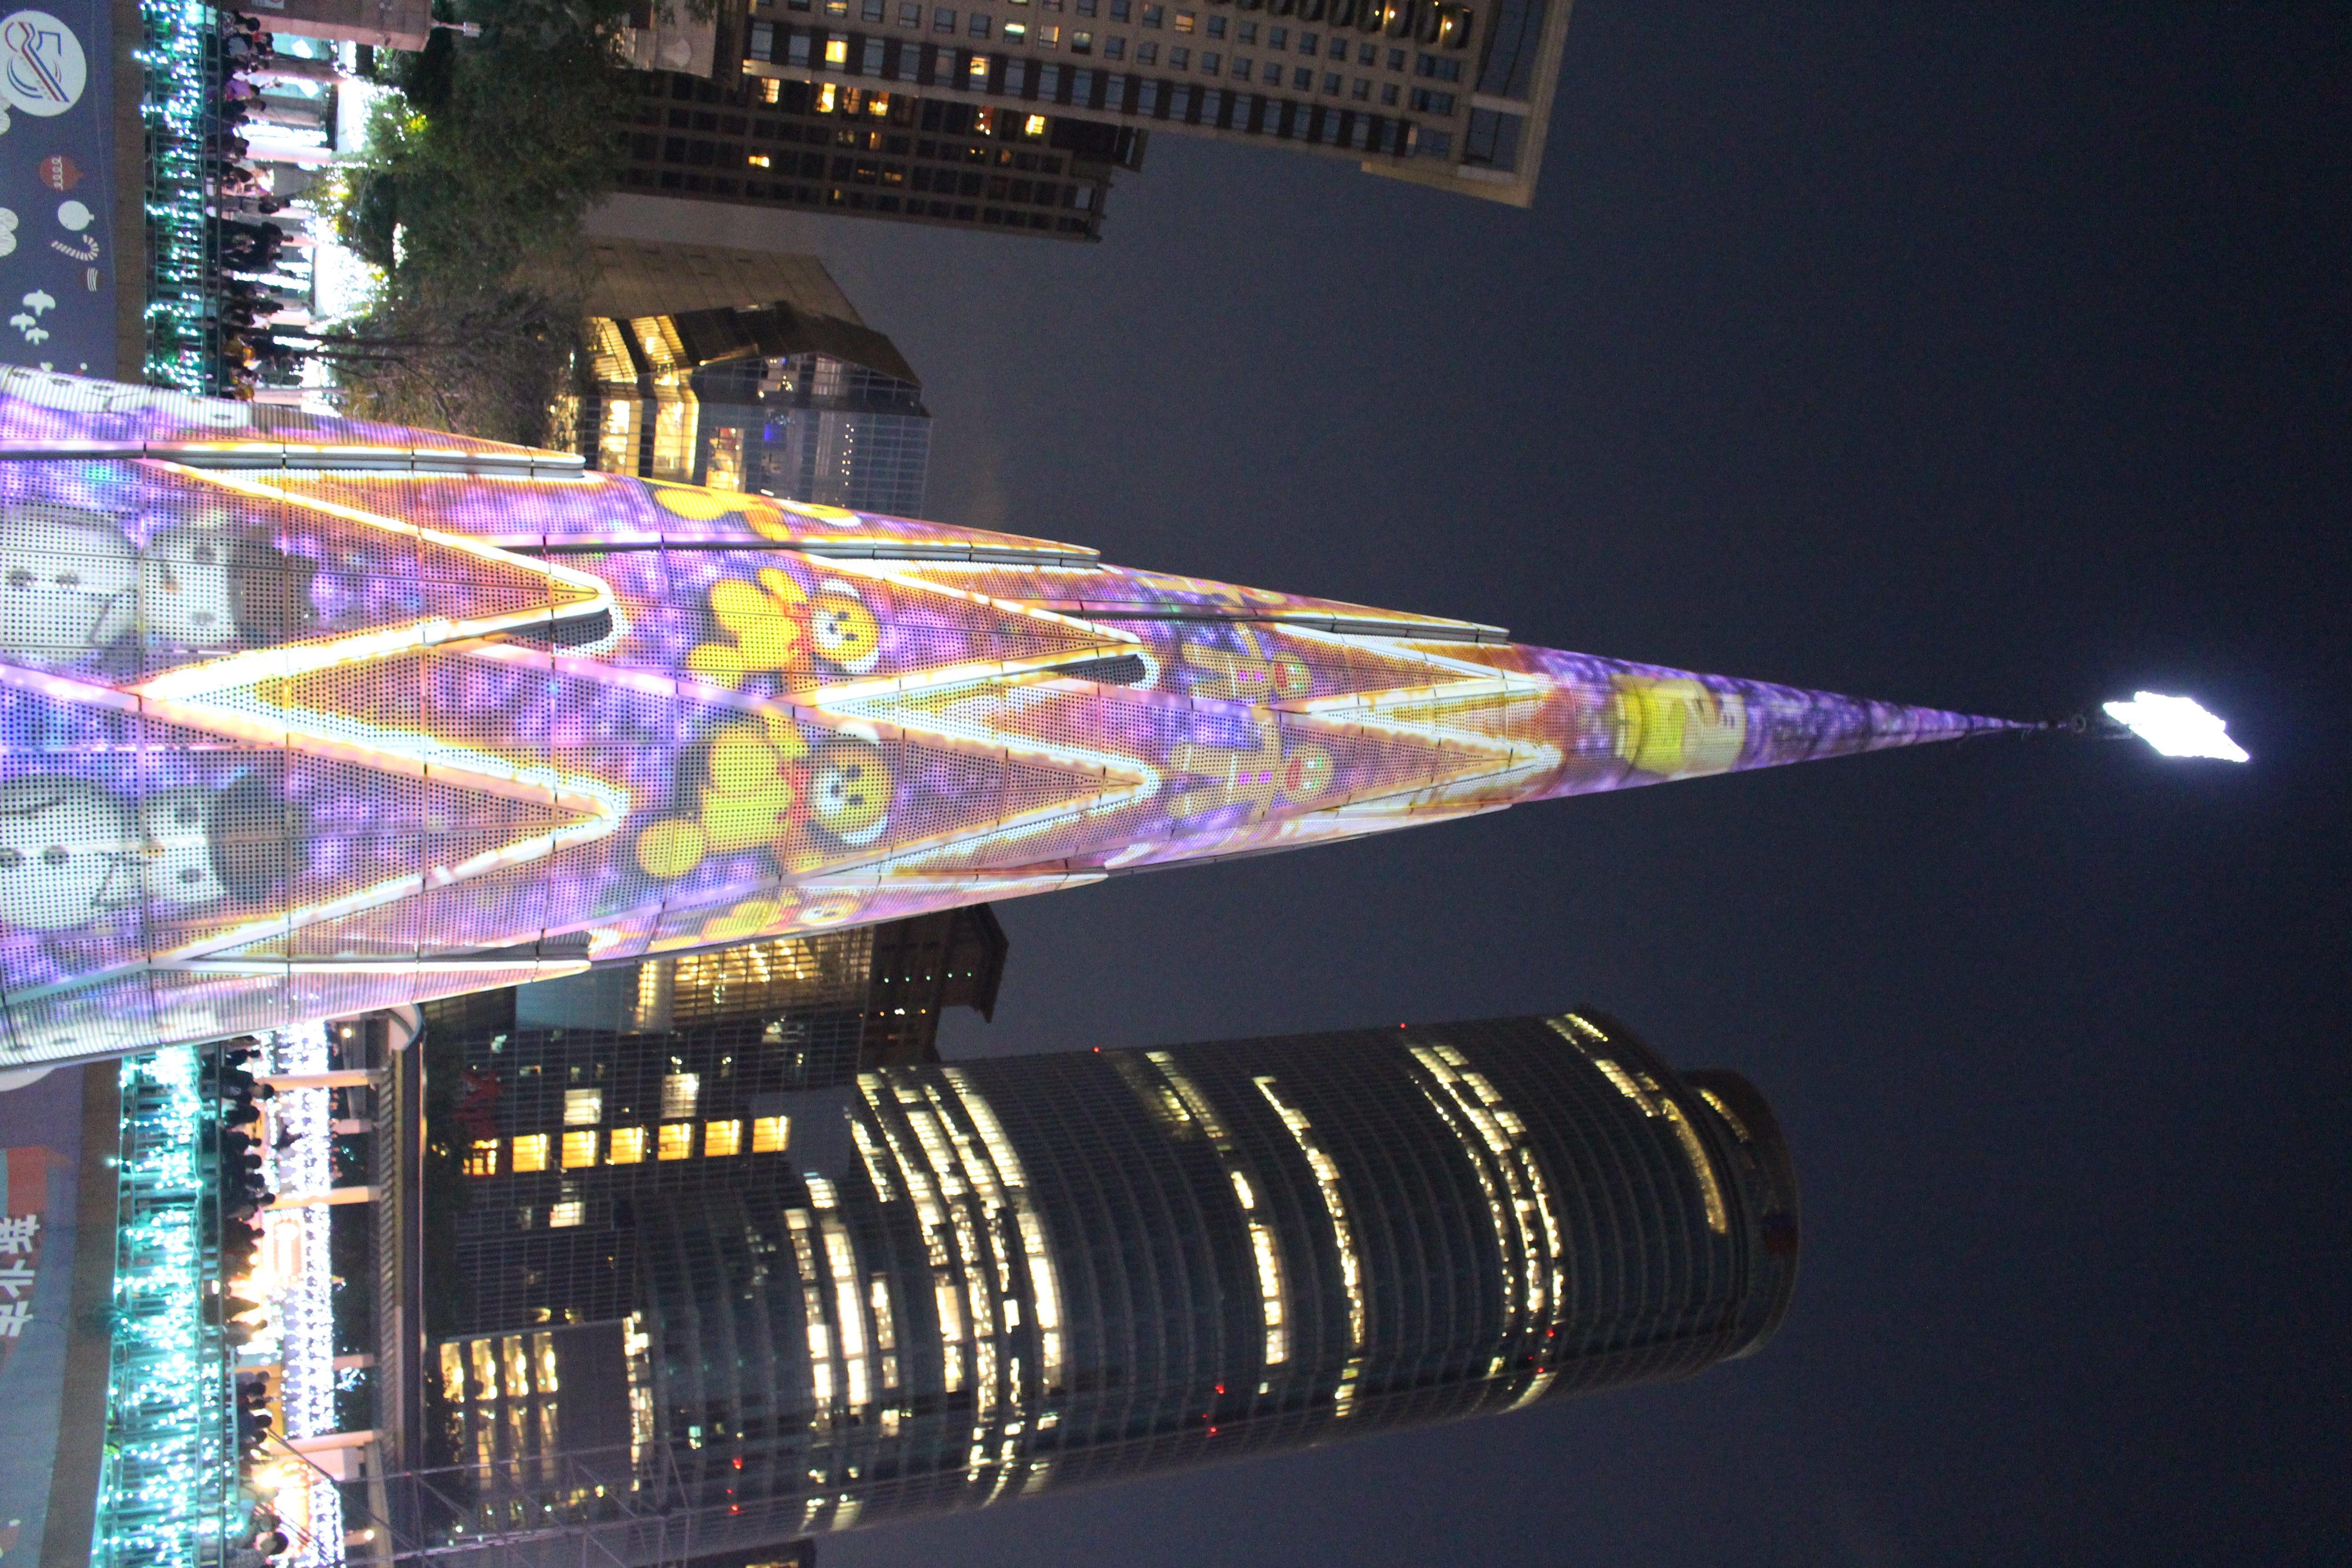 The 360-degree 3D label flash Christmas tree. Photo/Hu, Fan(胡凡)